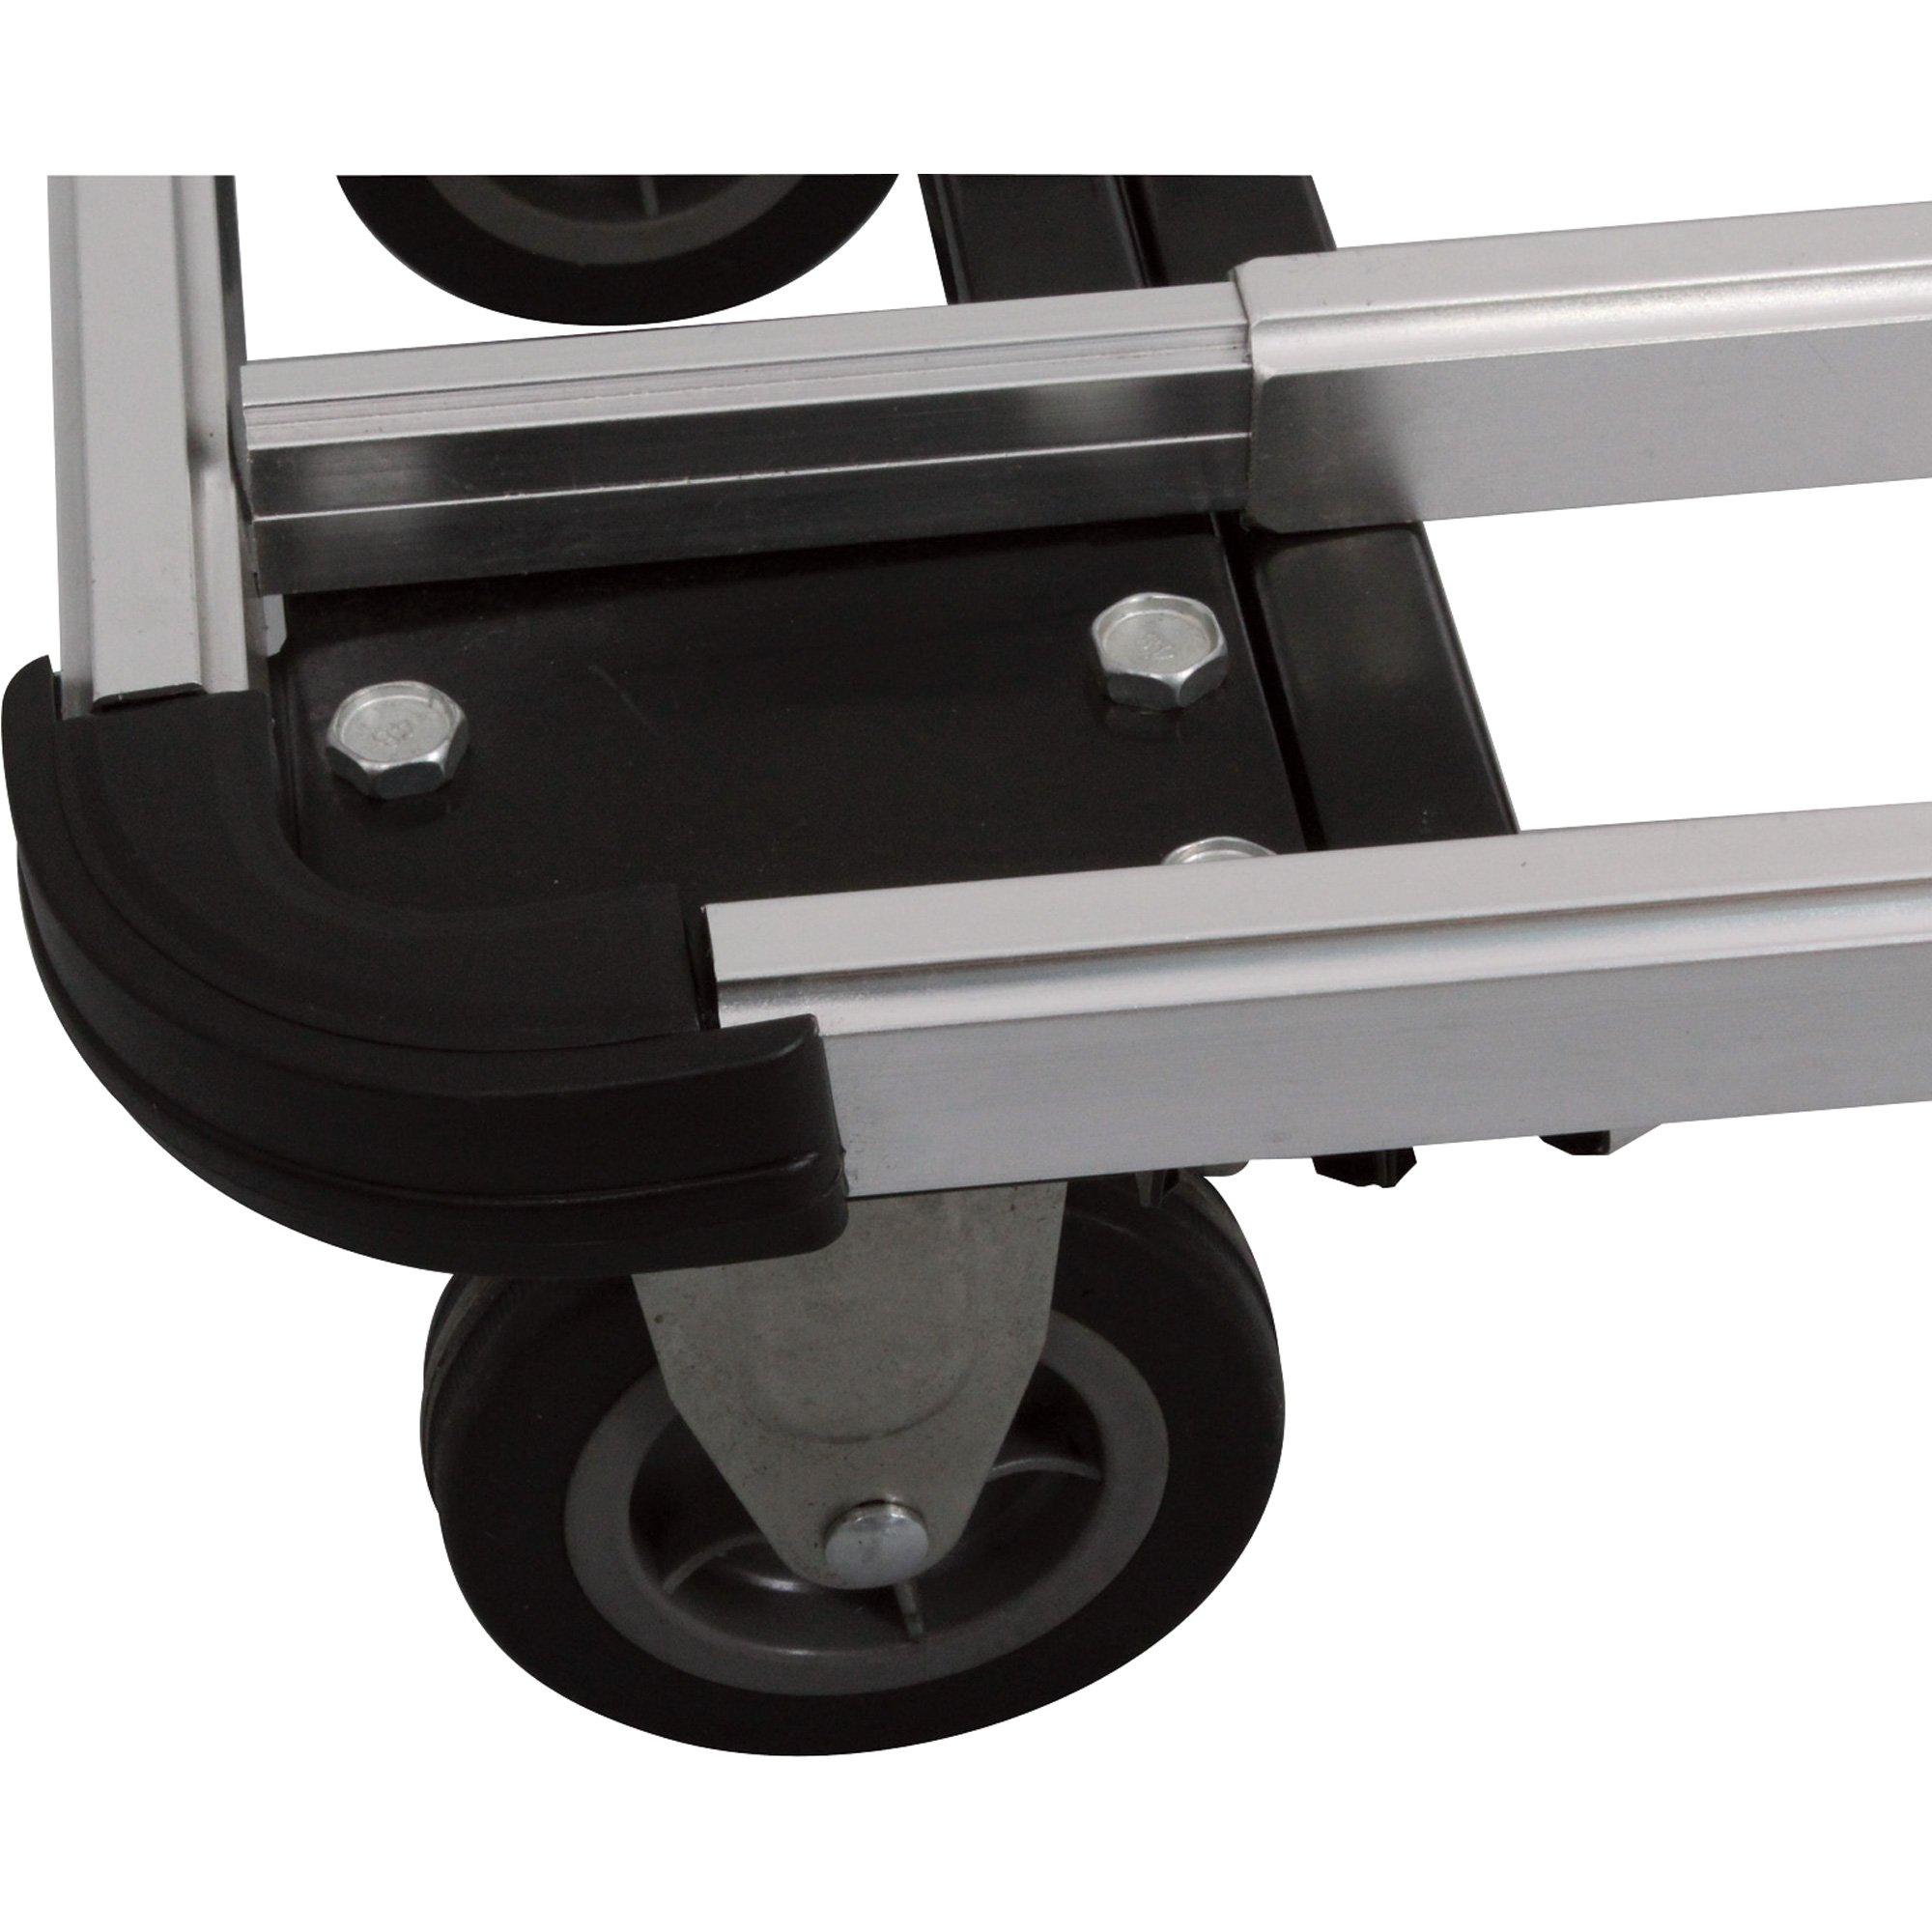 Roughneck Folding Platform Truck - 330-Lb. Capacity by Roughneck